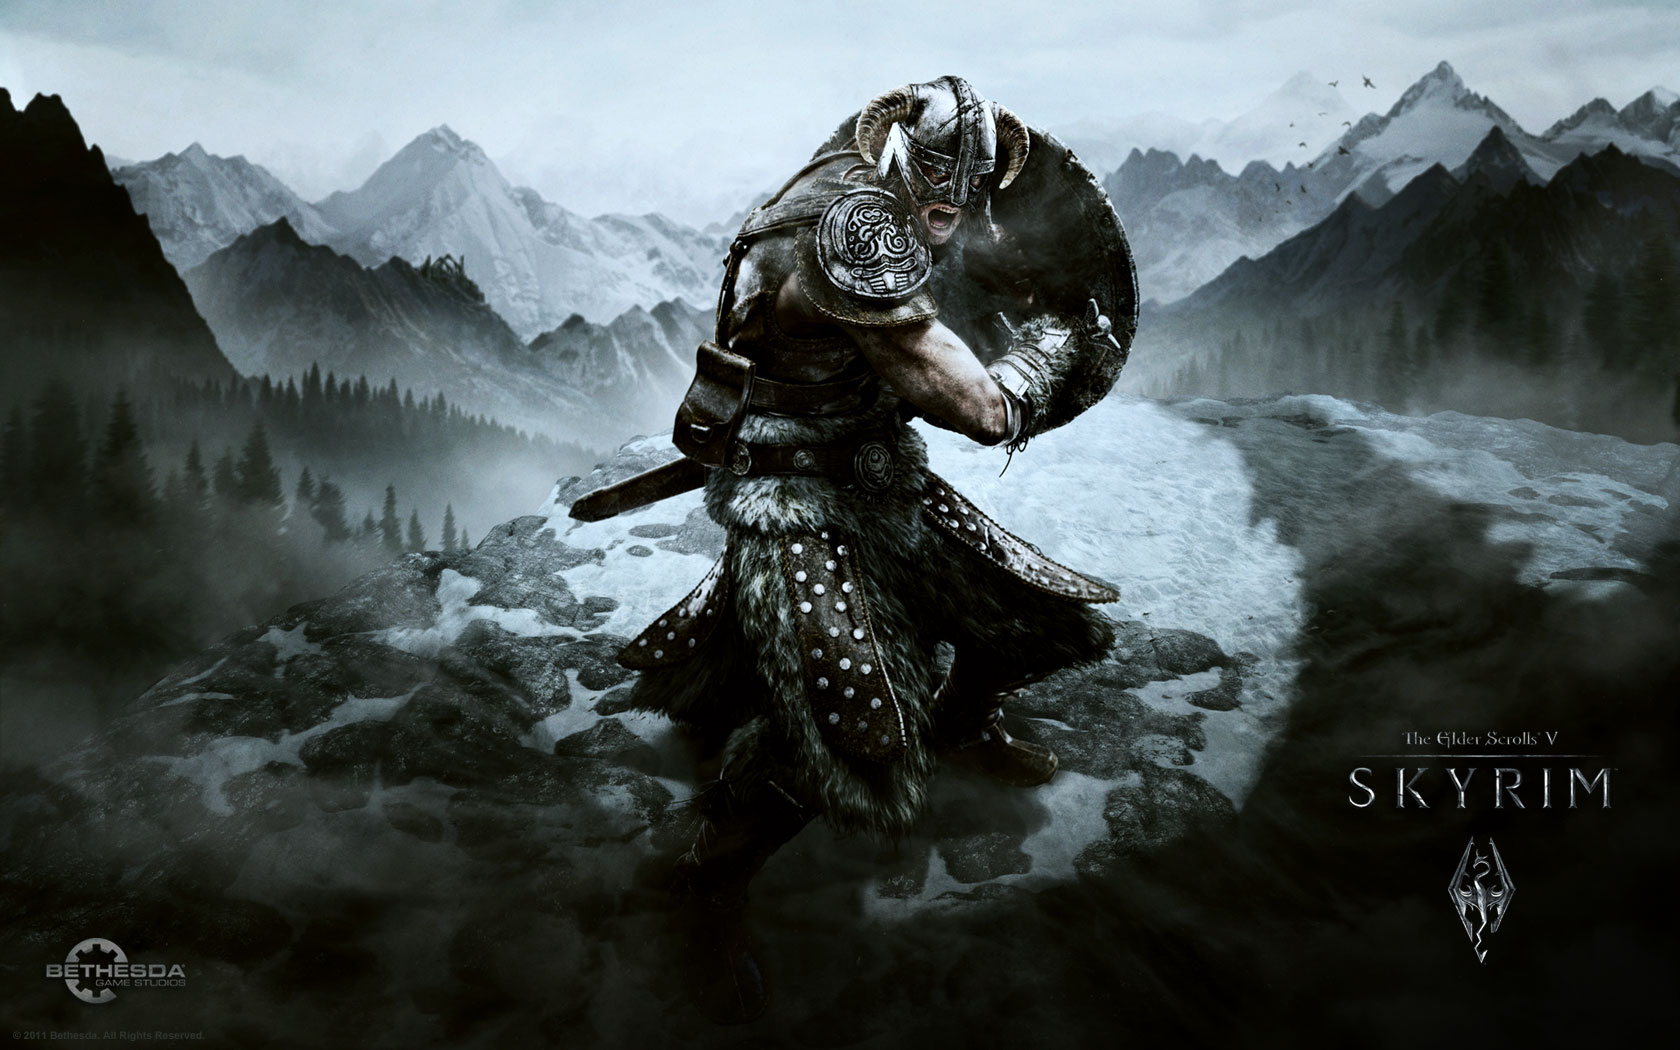 The elder scrolls v skyrim rutor - c4